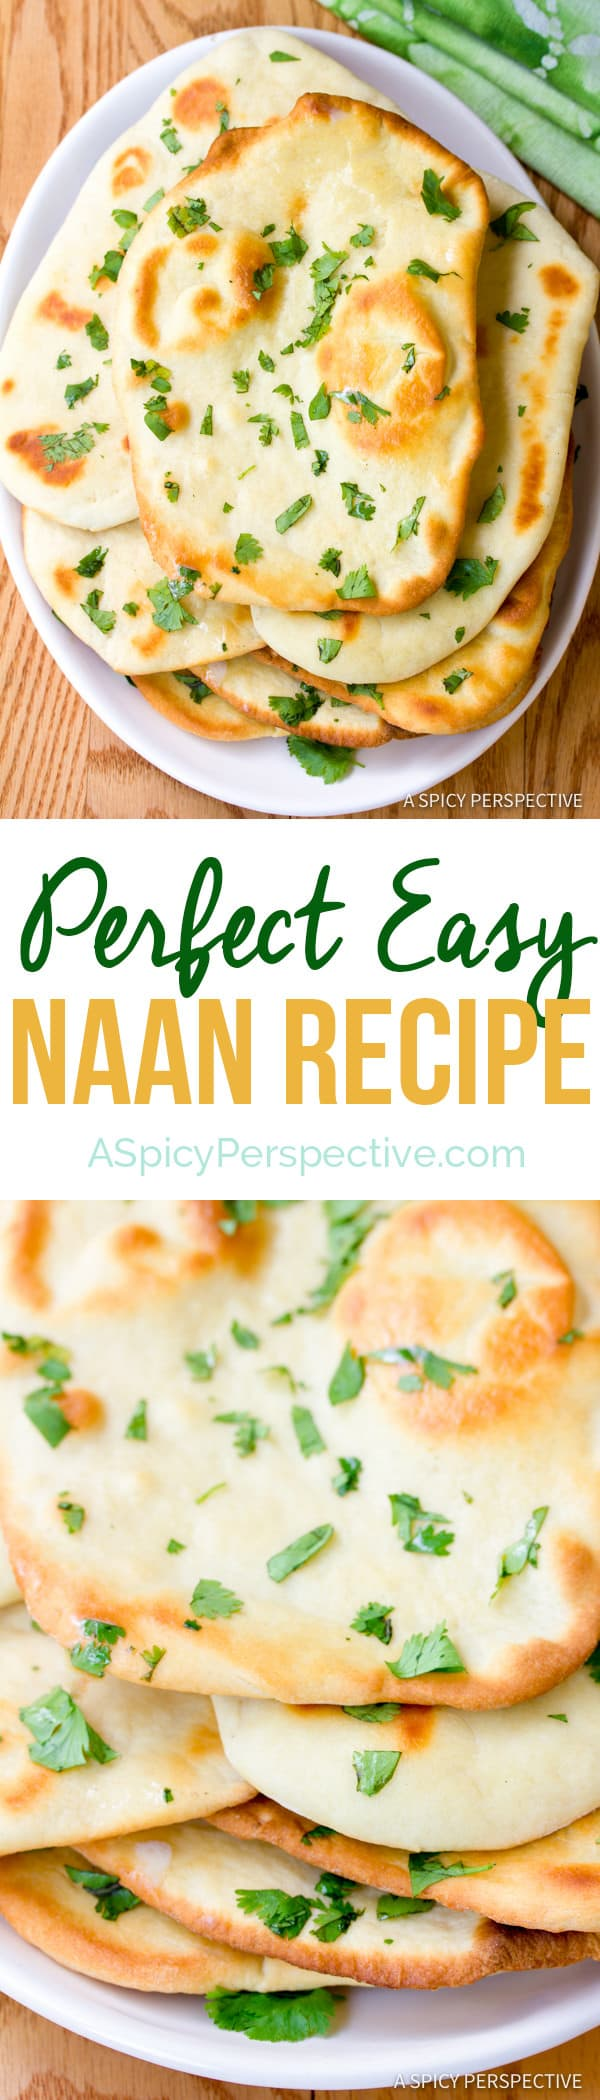 Perfect Easy Naan Recipe   ASpicyPerspective.com